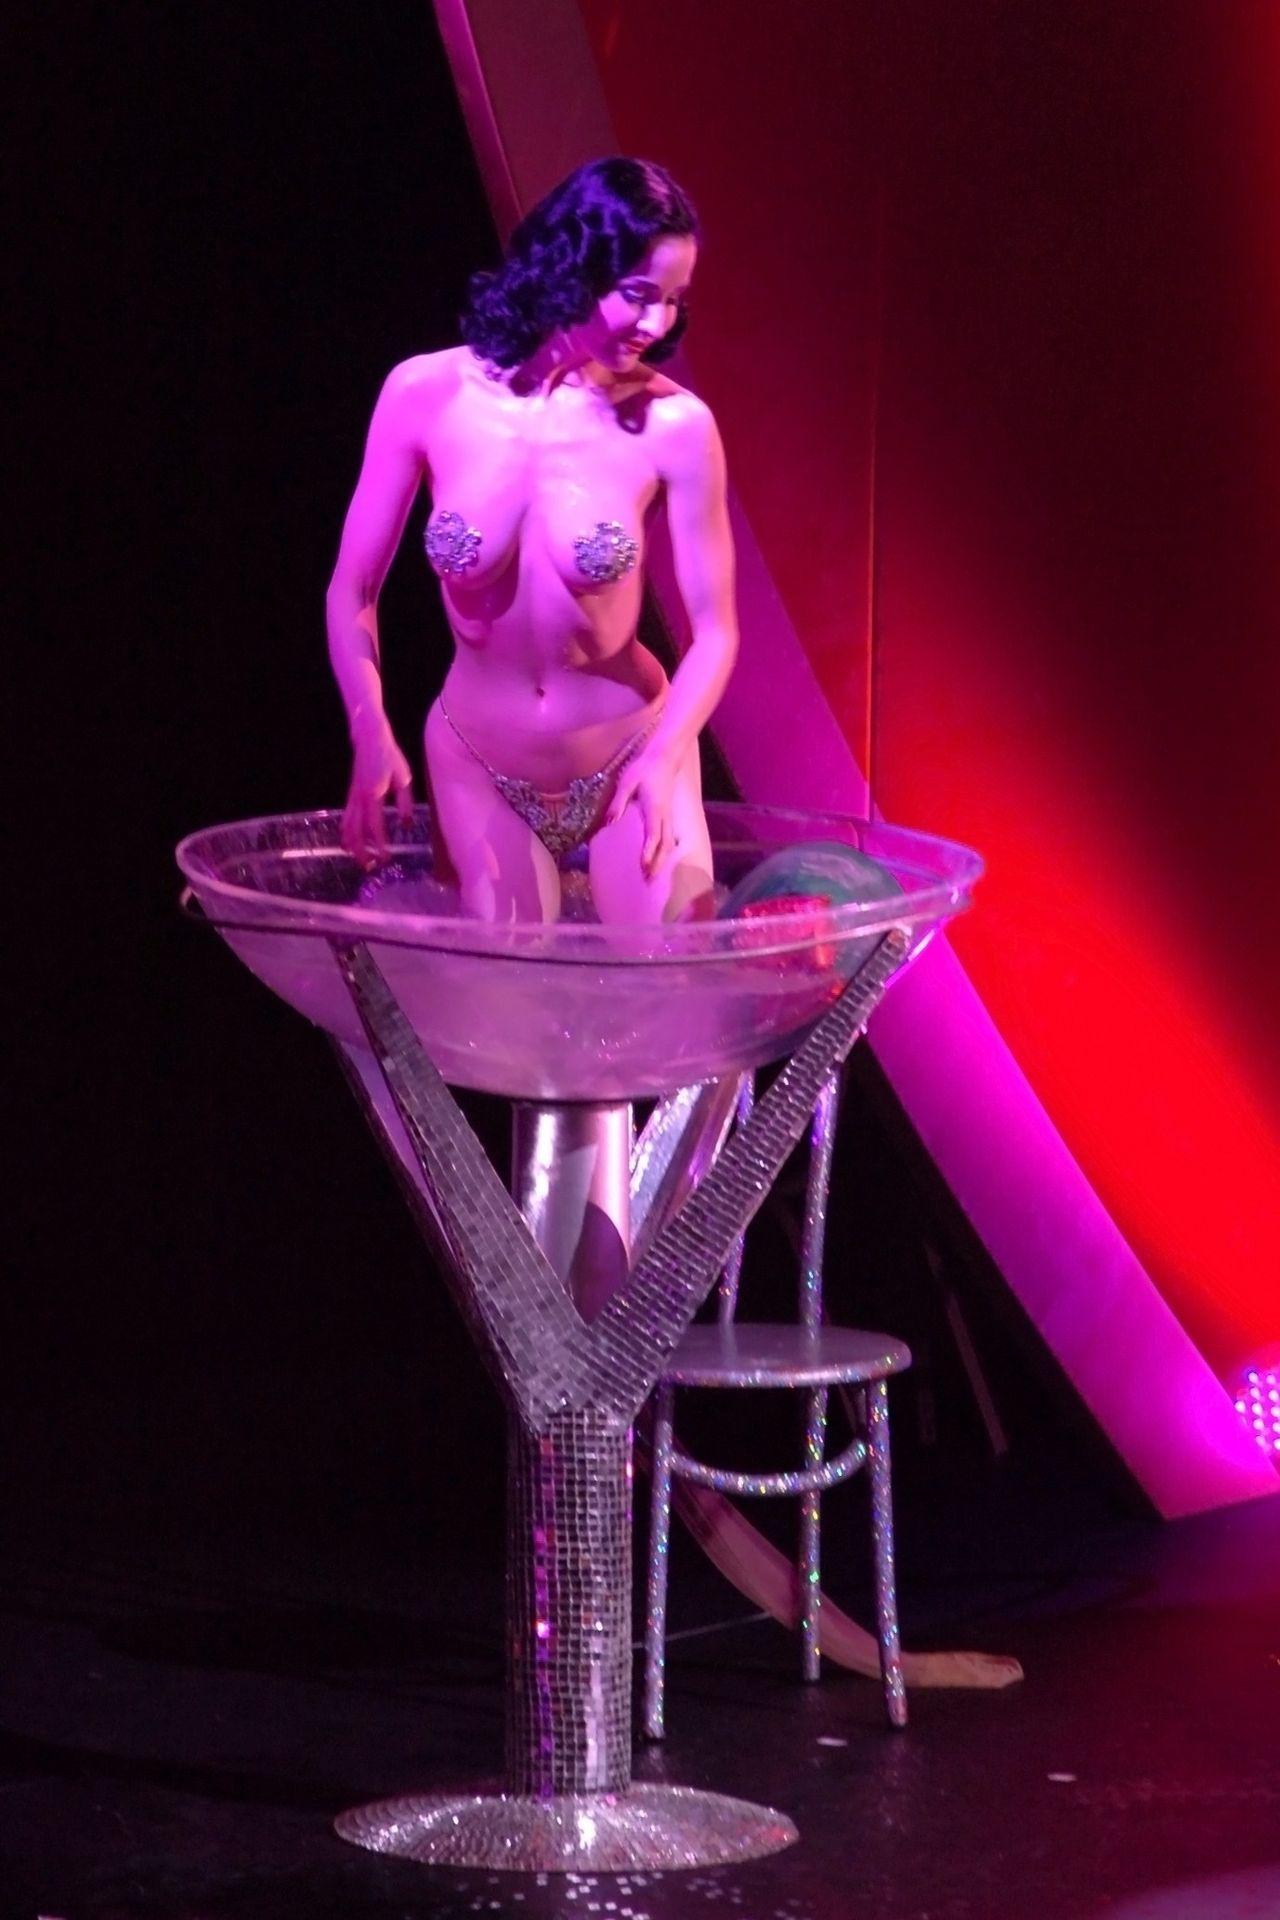 Dita Von Teese Performs At Erotica 06 In London 0031